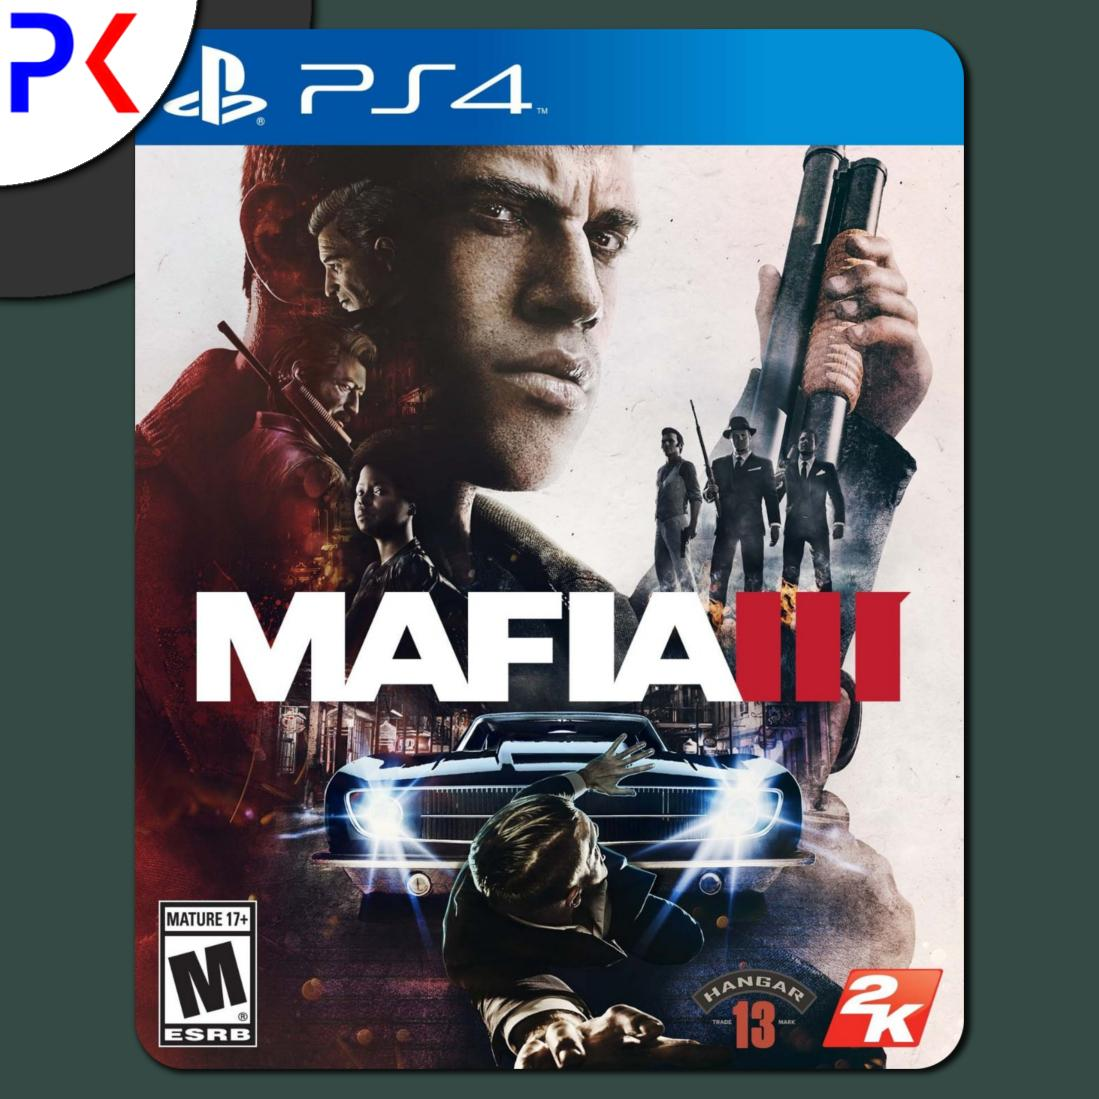 PS4 Mafia III (R1)